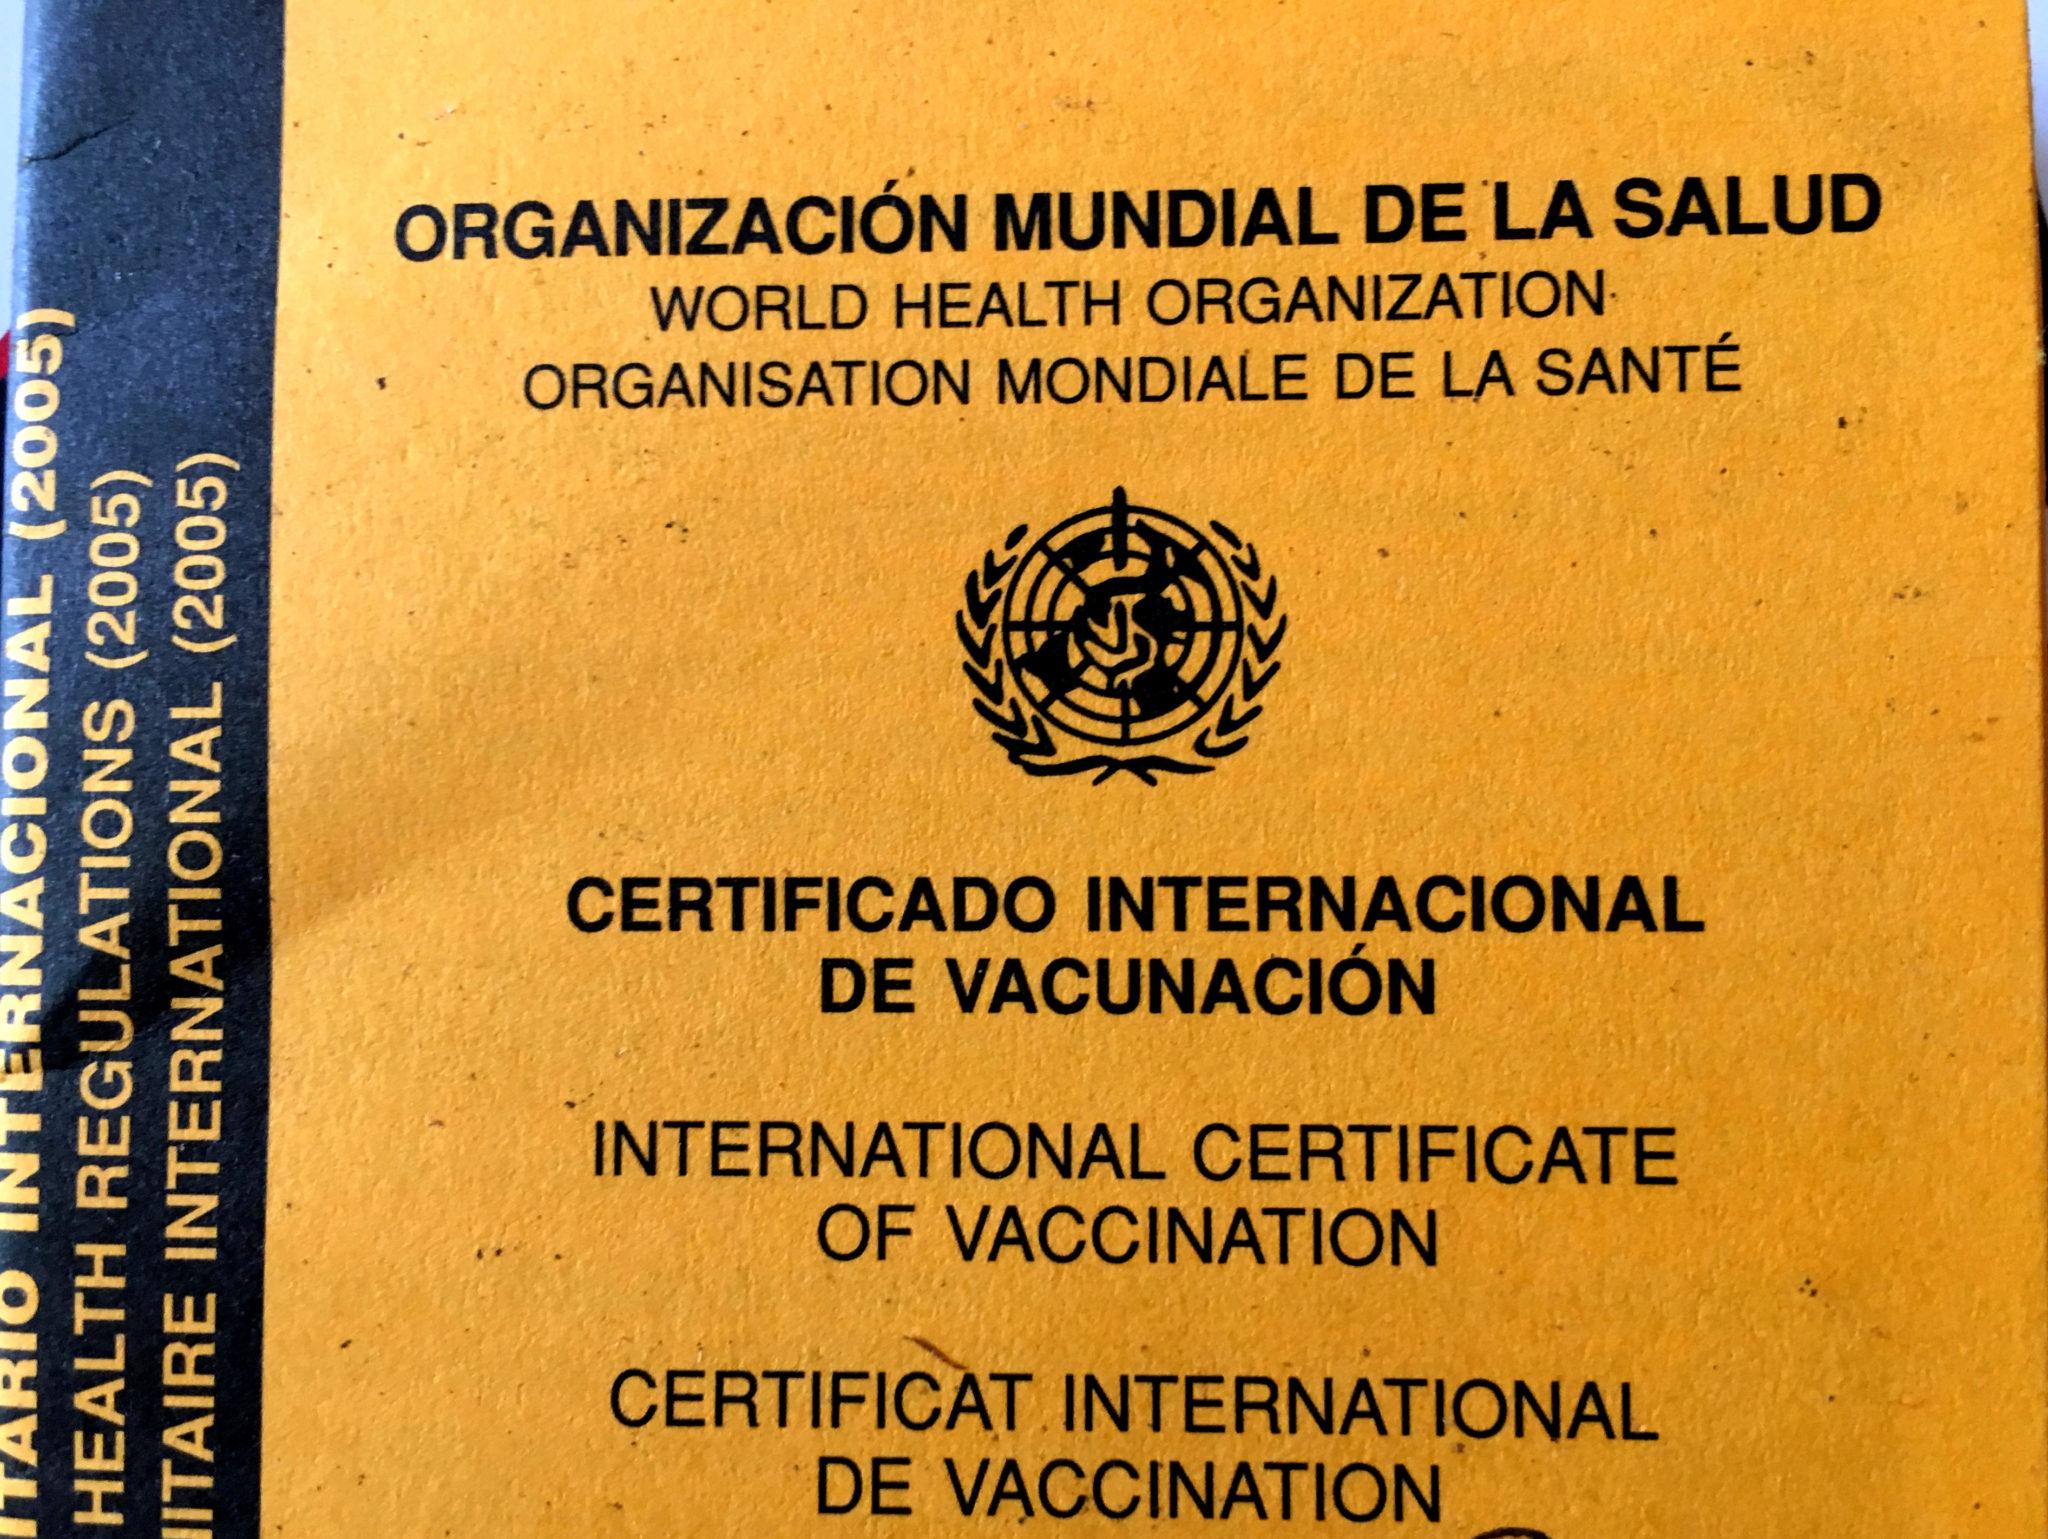 donde se cornbread solfa syllable vacuna de solfa syllable fiebre amarilla linear unit bogota